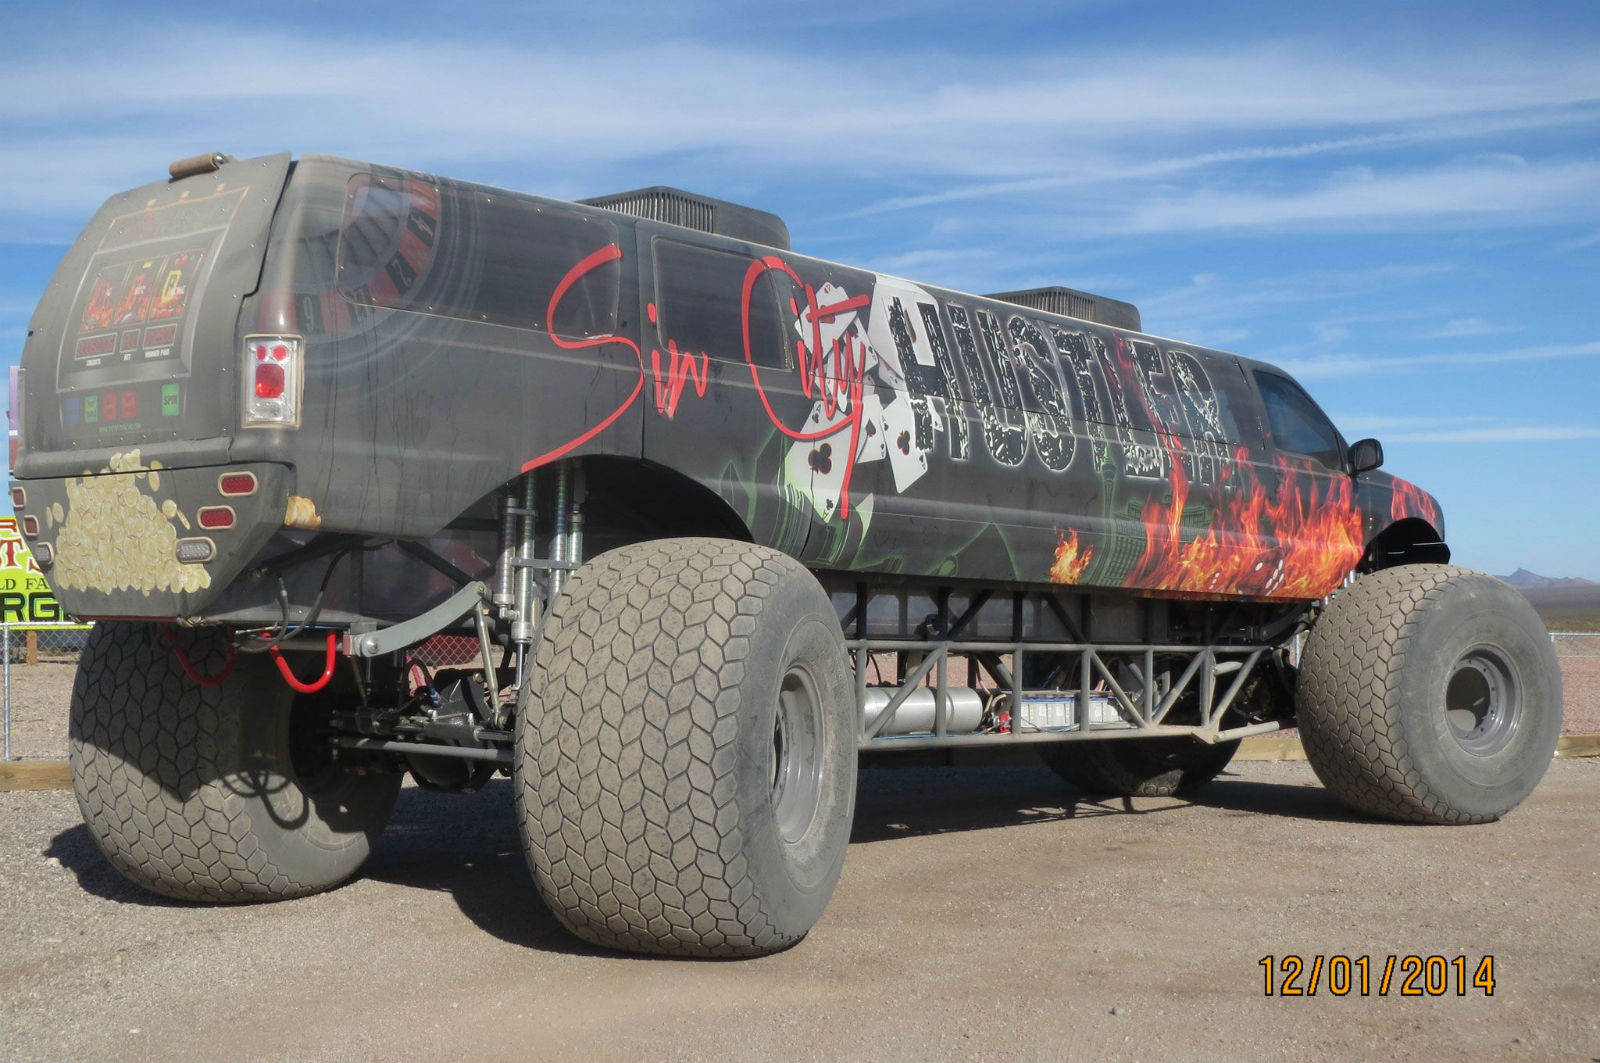 Sin City Hustler Monster Truck Front End View No Car No Fun